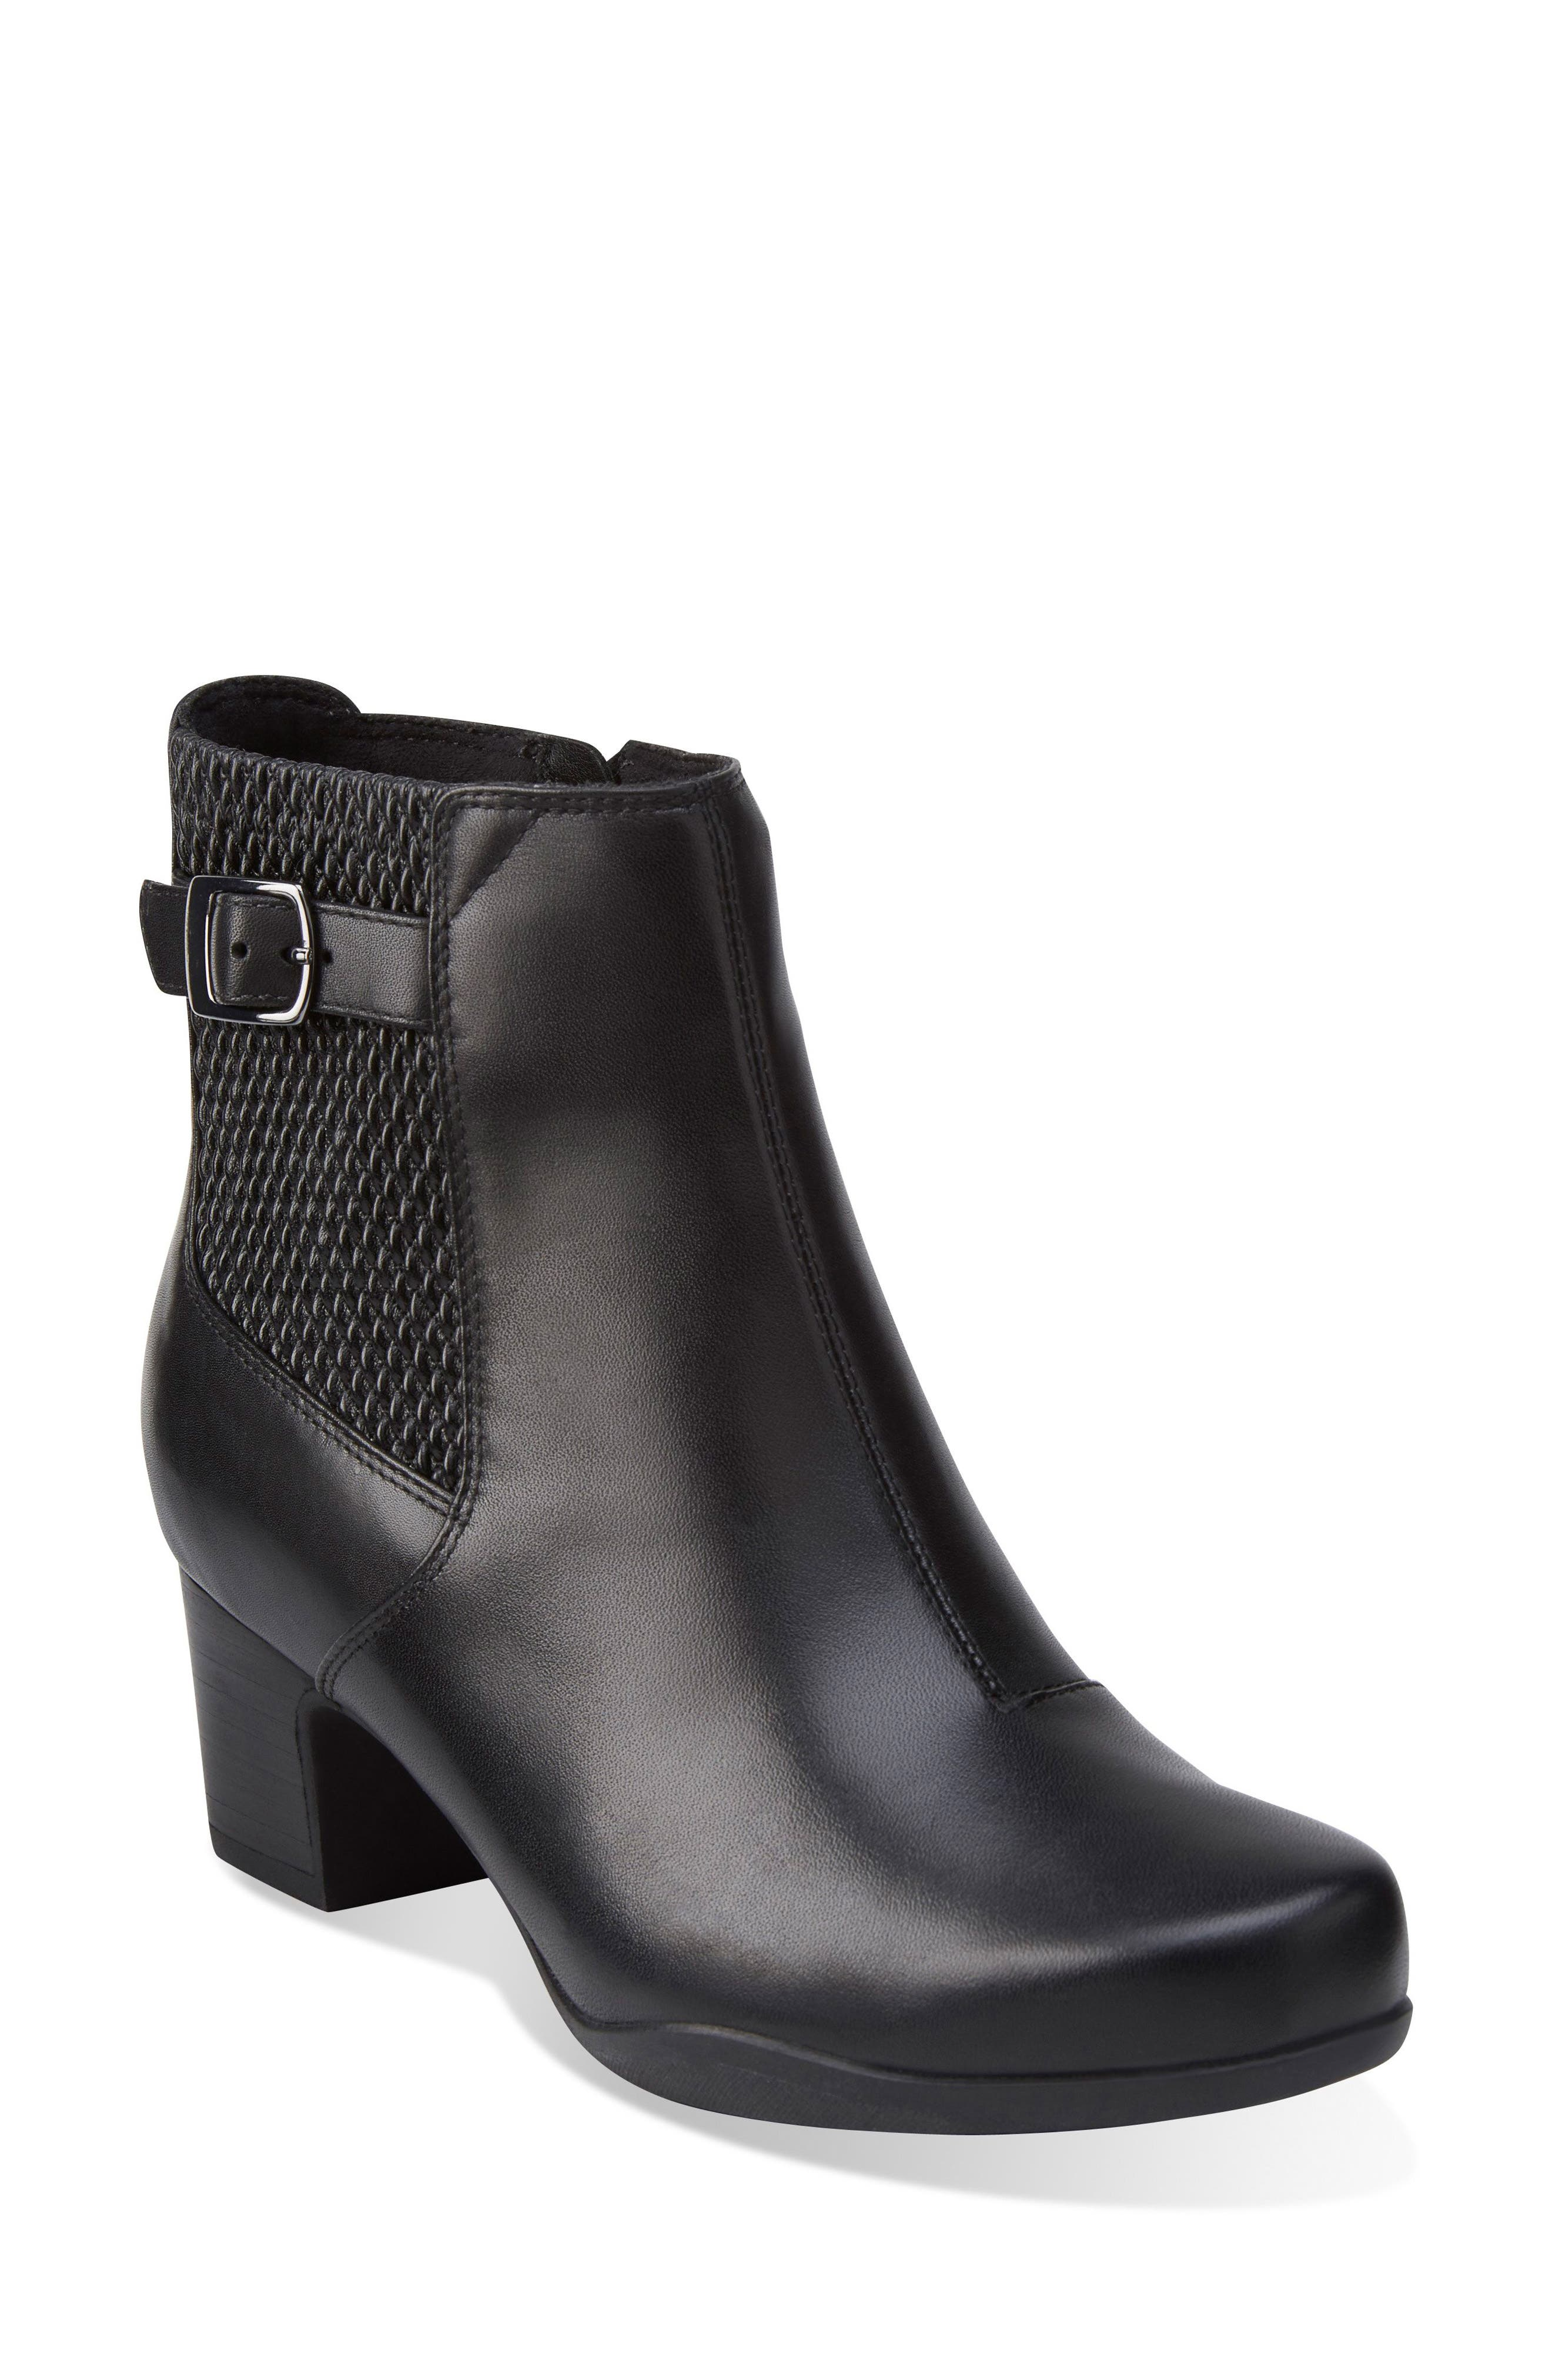 Rosalyn Lara Waterproof Boot,                         Main,                         color, Black Leather